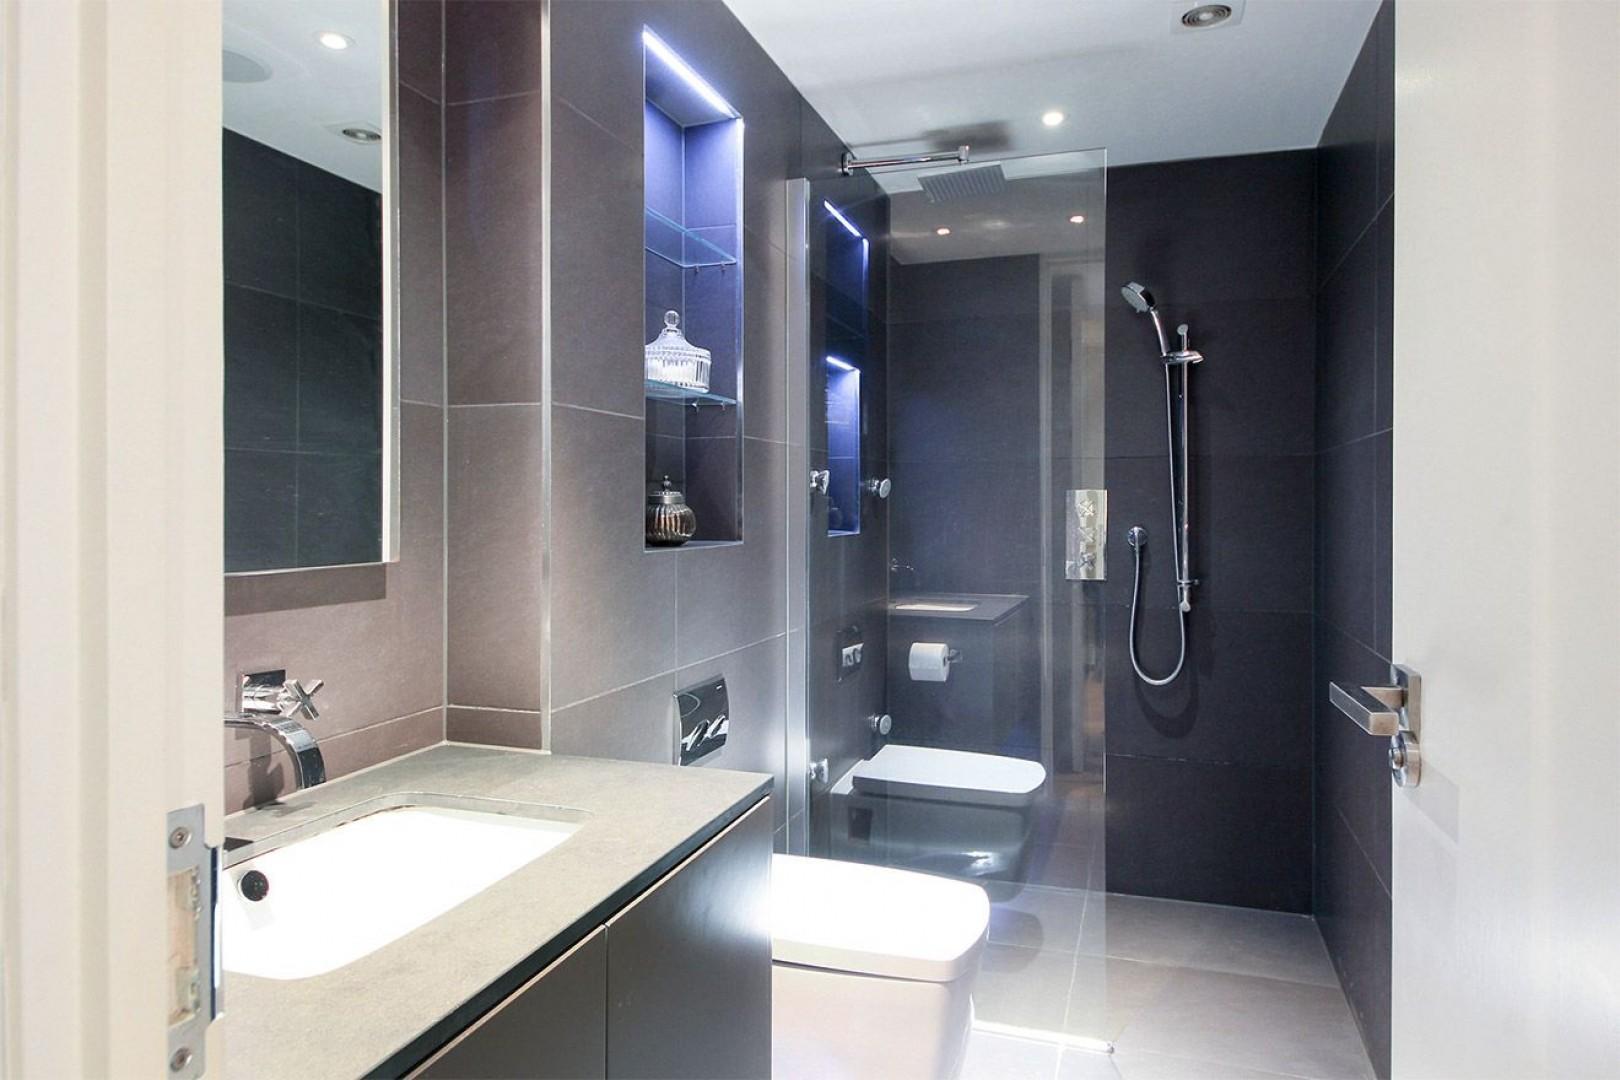 En suite bathroom with large walk-in shower, sink and toilet